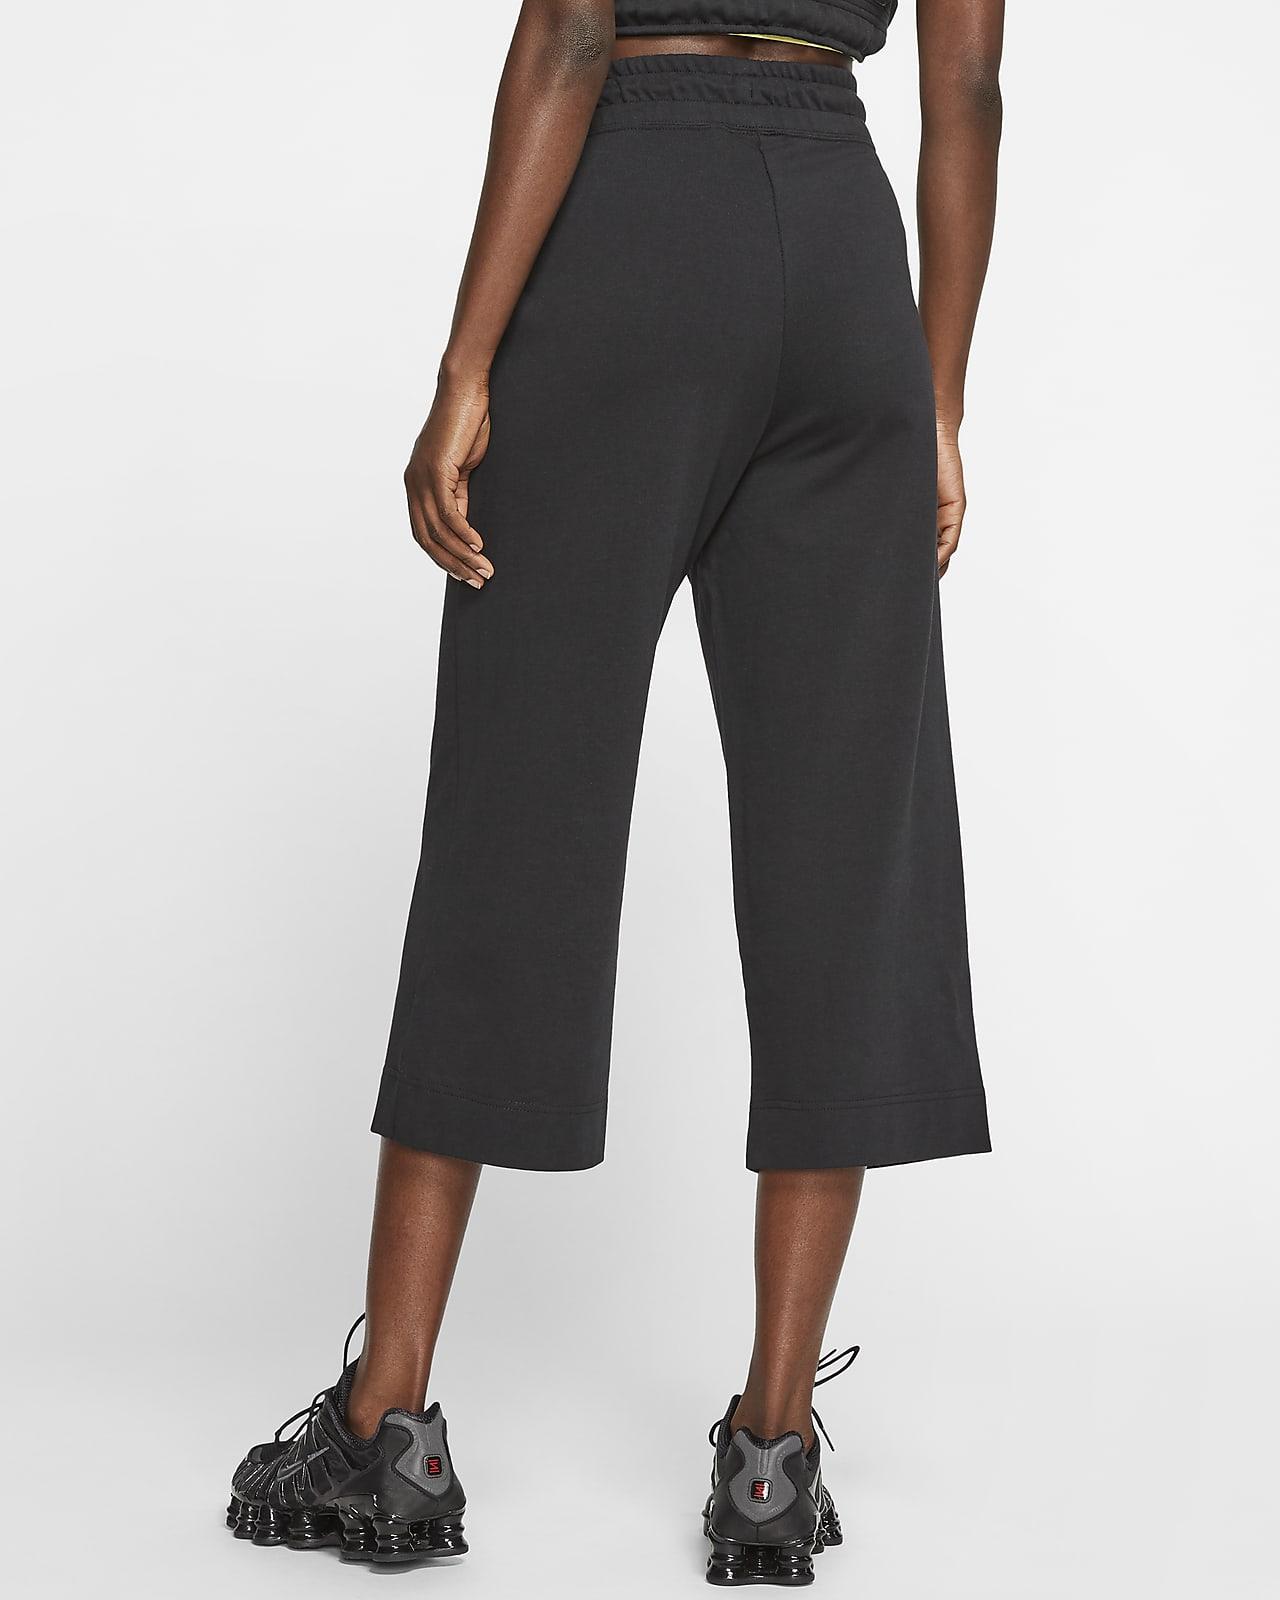 caliente un acreedor Suplemento  Pantalones capri de tejido de punto para mujer Nike Sportswear. Nike.com